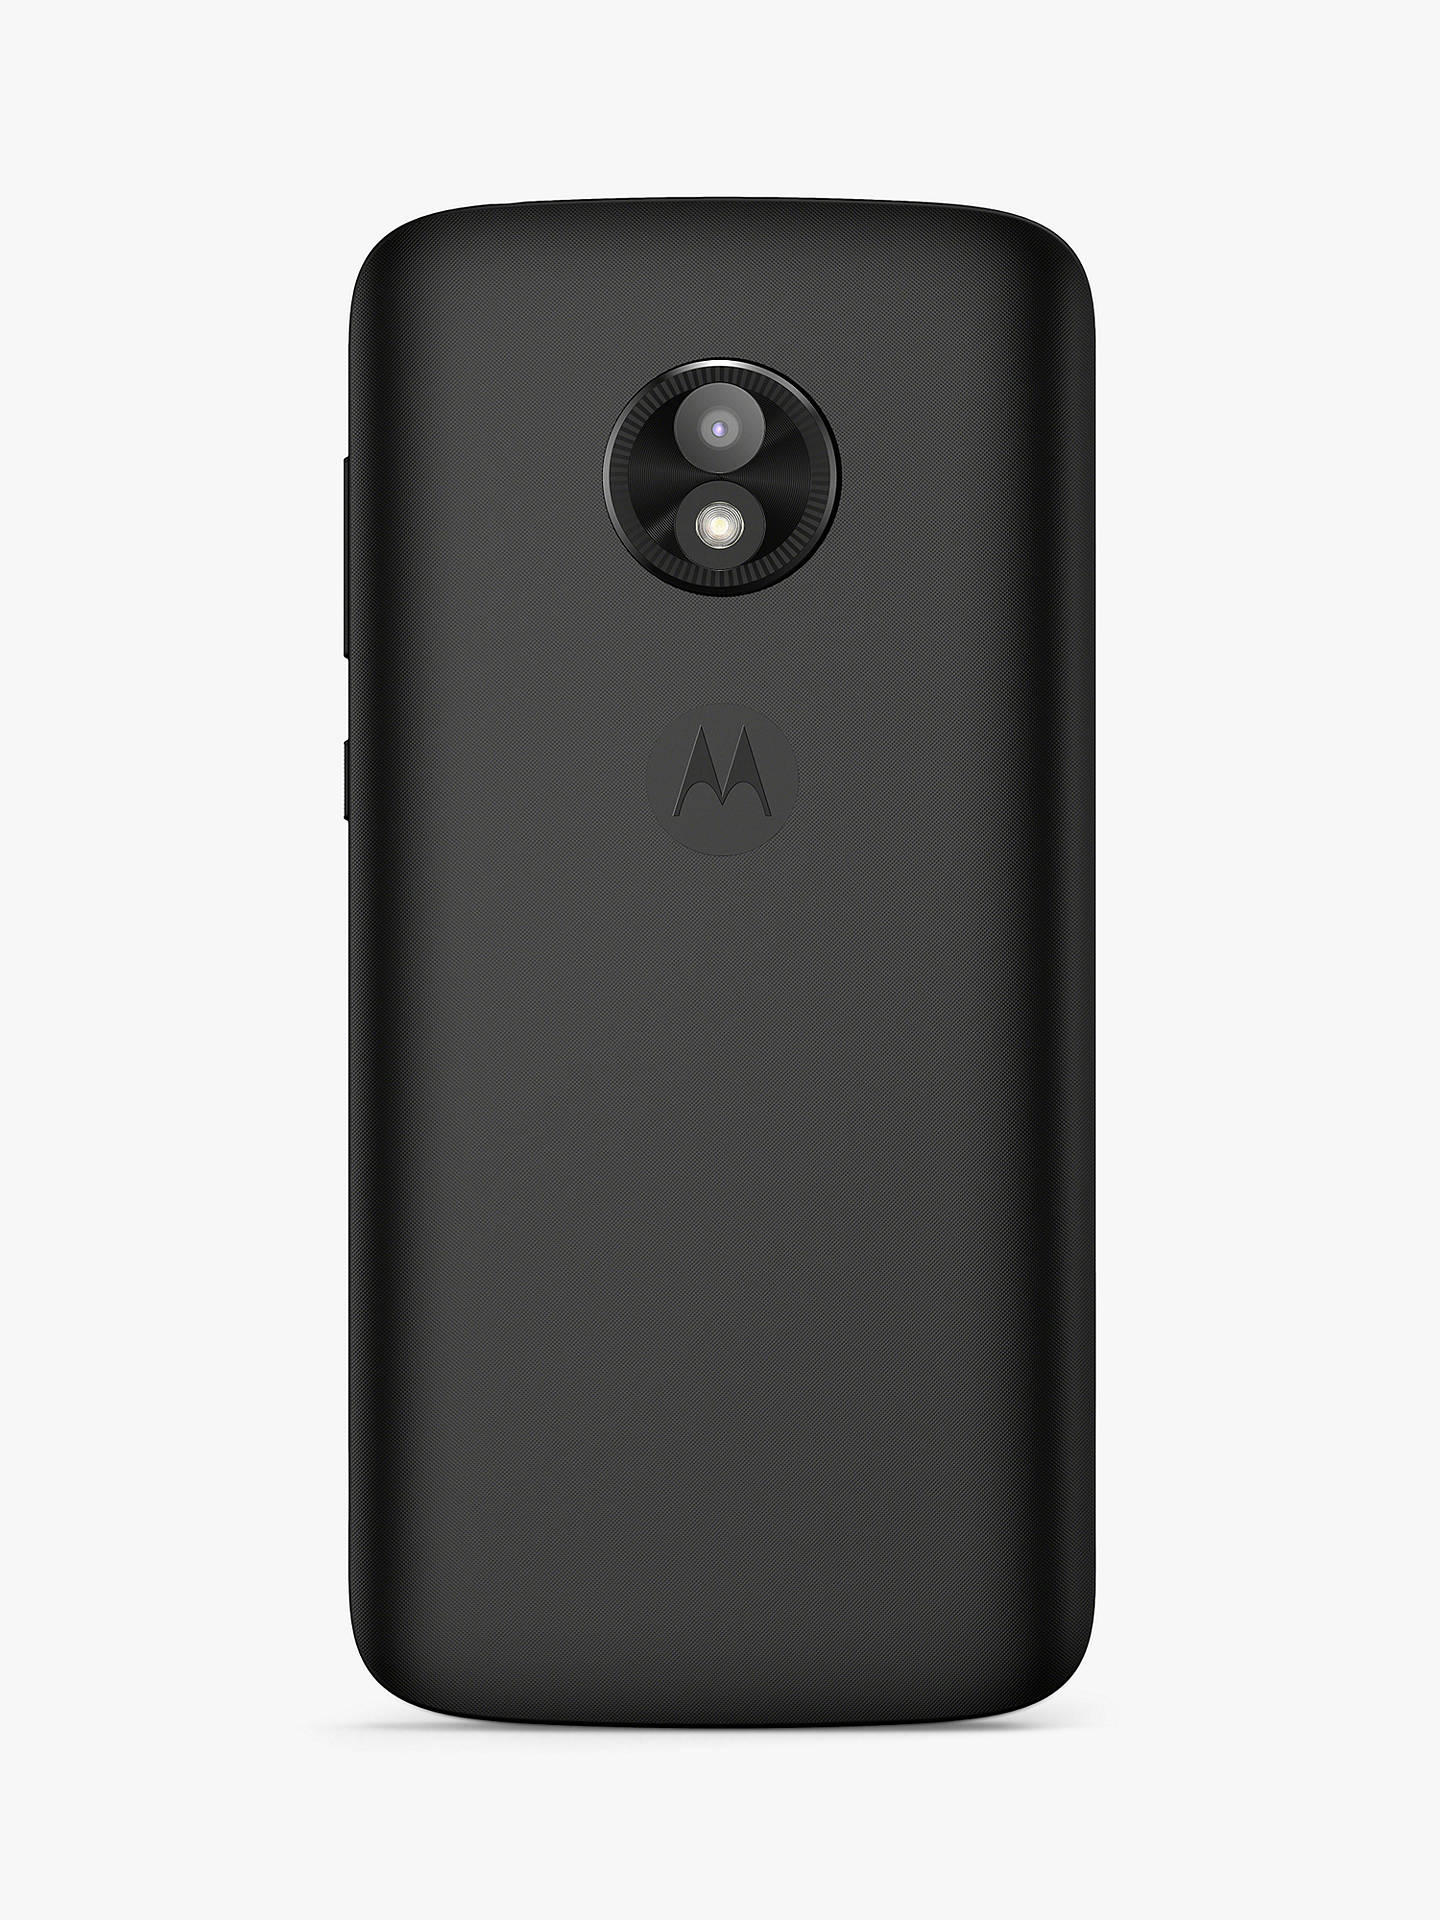 Motorola e5 play Smartphone, Android, 5 34